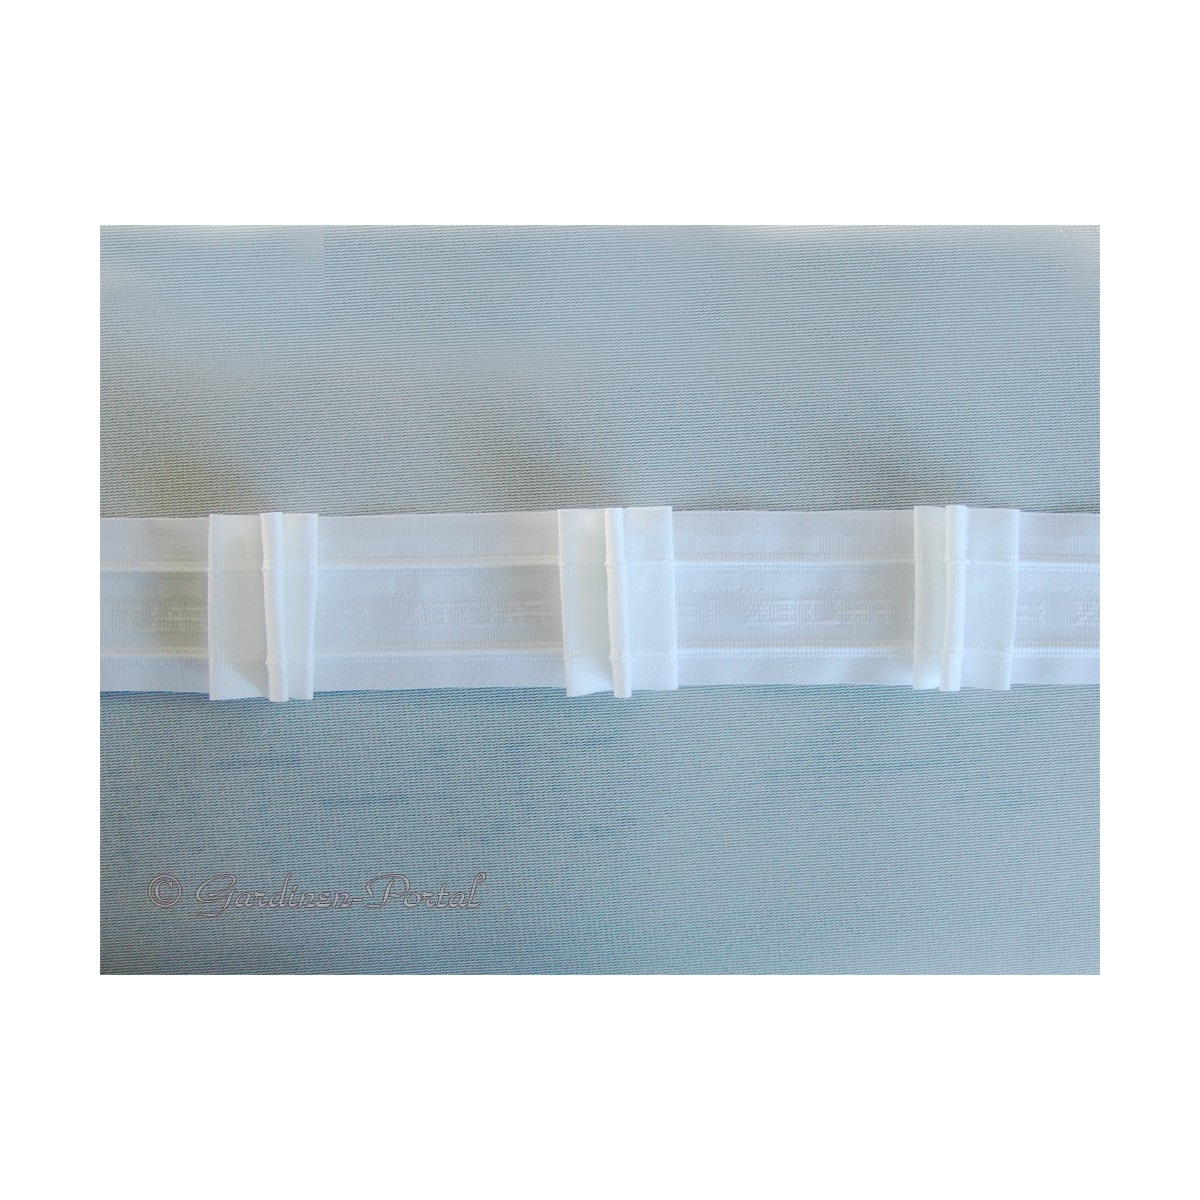 heimtextilien zubeh r zugband automatik faltenband 3 falten 1 2 w. Black Bedroom Furniture Sets. Home Design Ideas